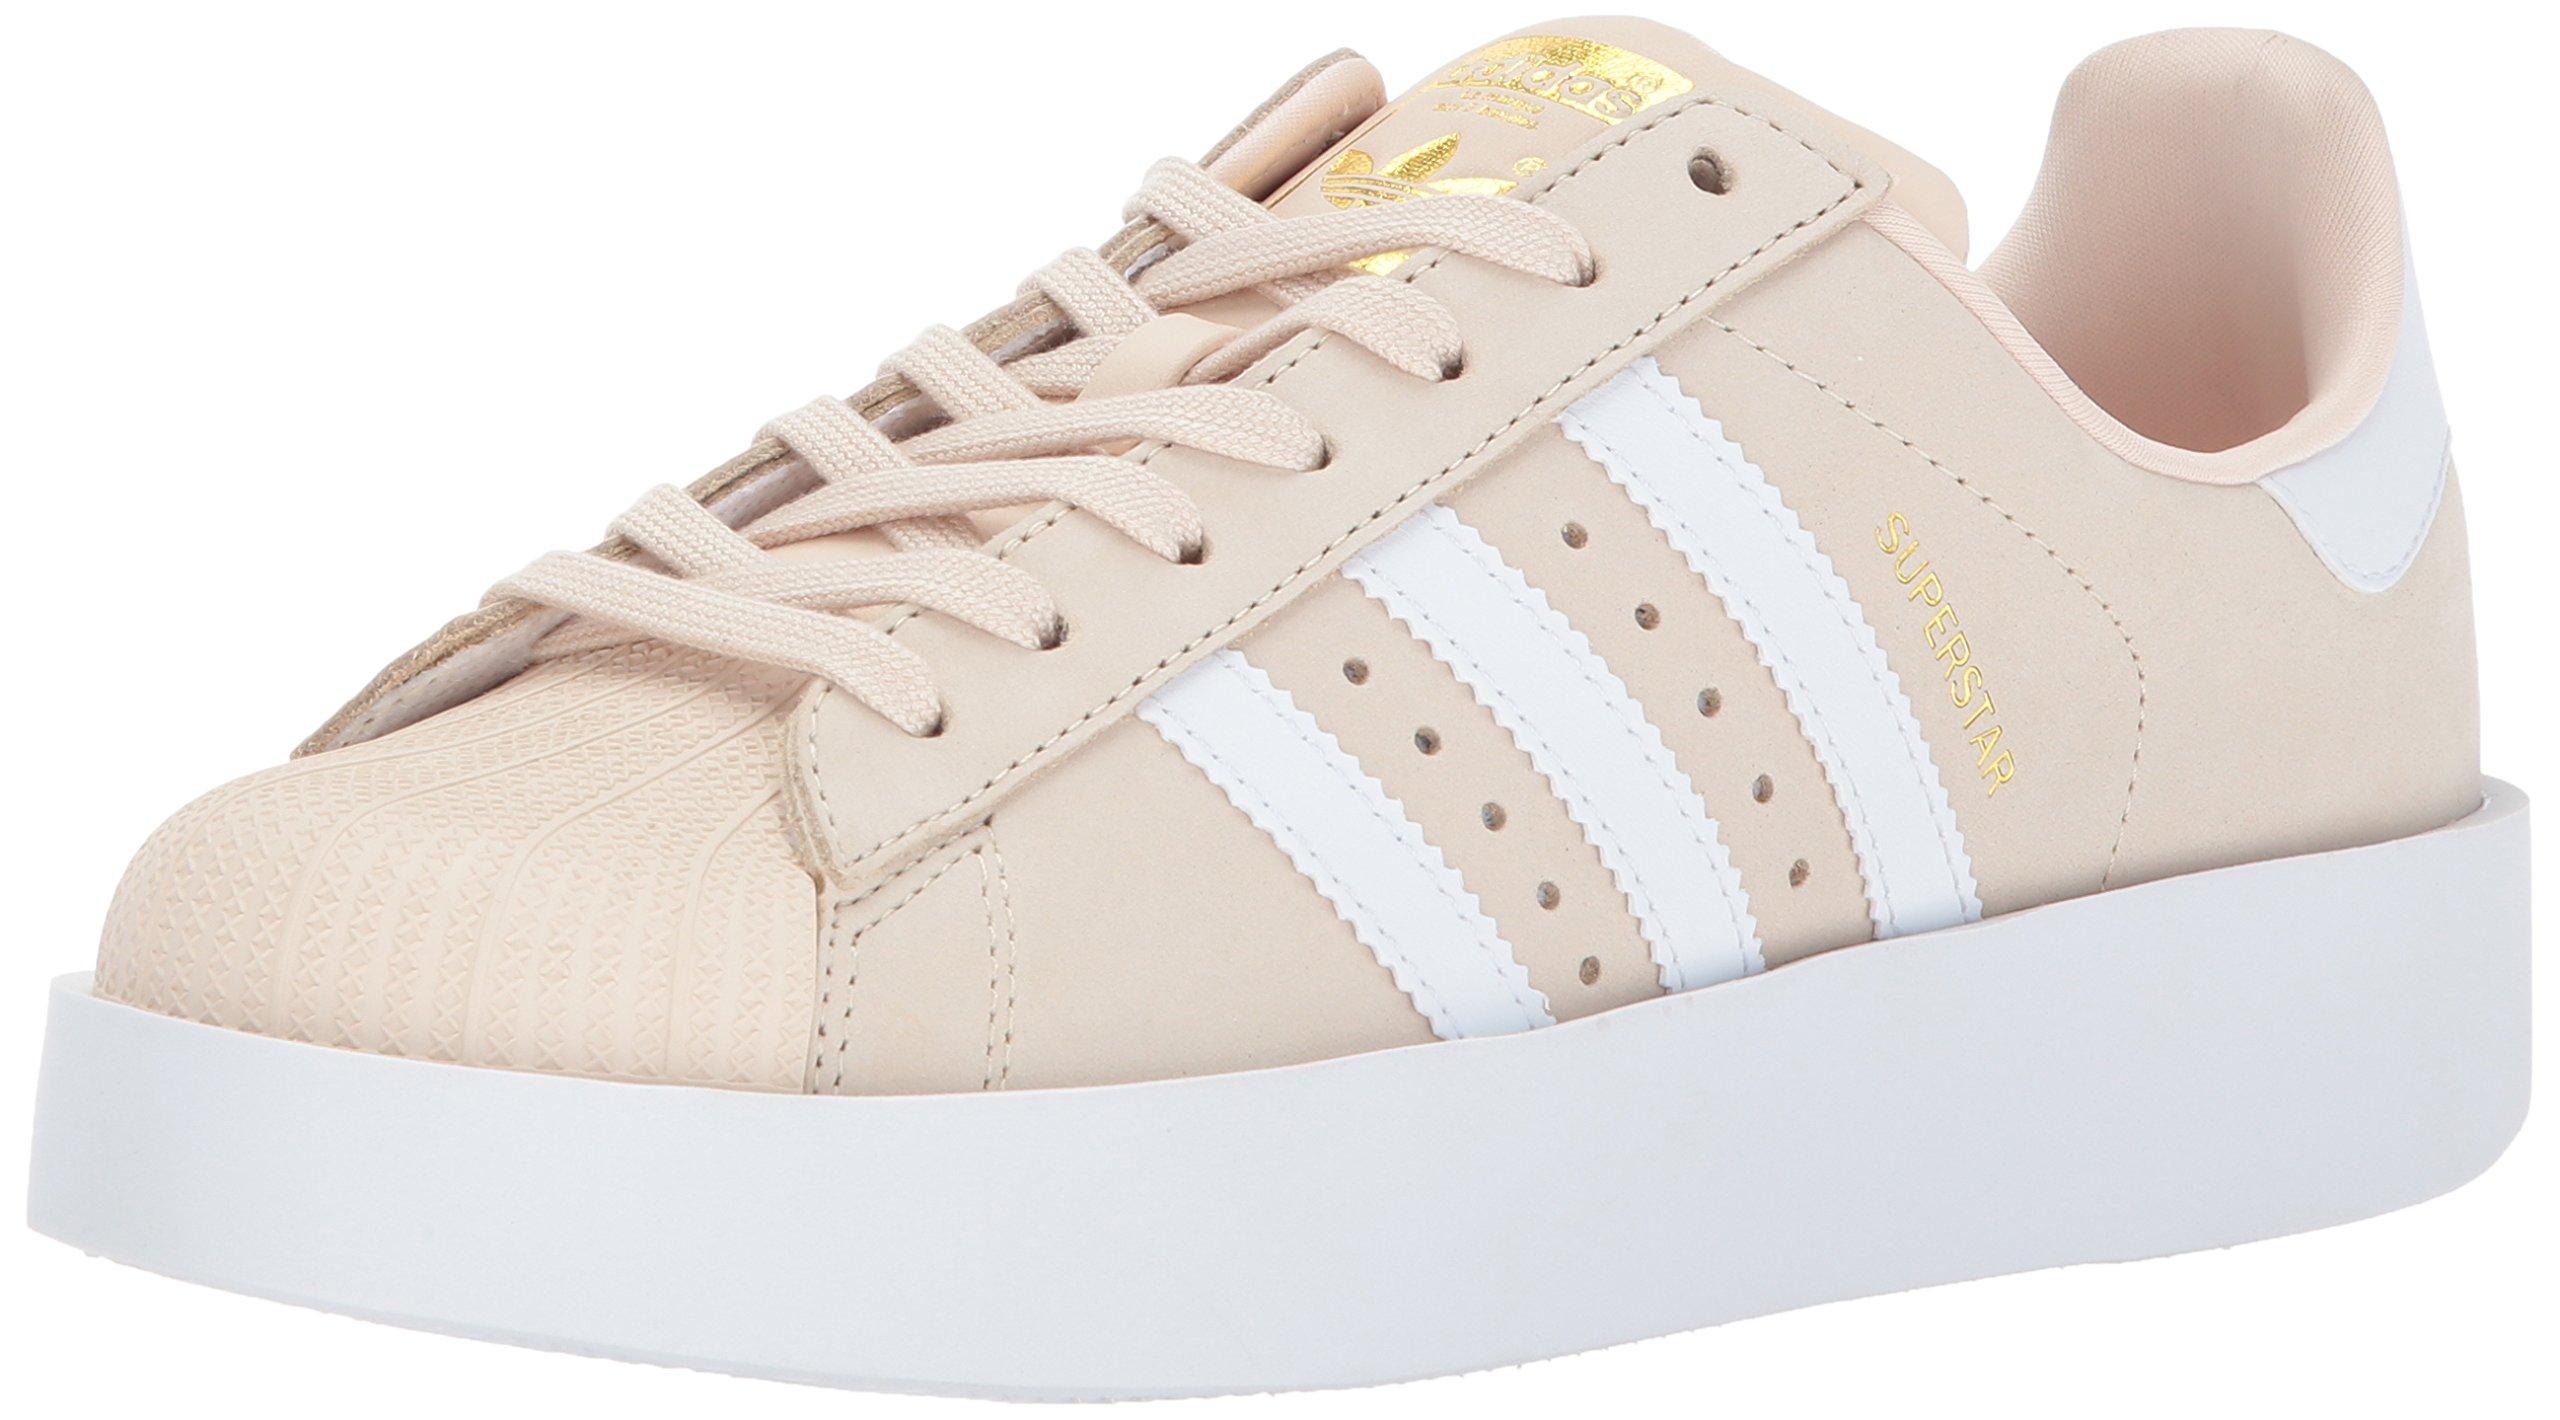 6c42c6afcfe5 Galleon - Adidas Originals Women s Superstar Bold W Running Shoe ...